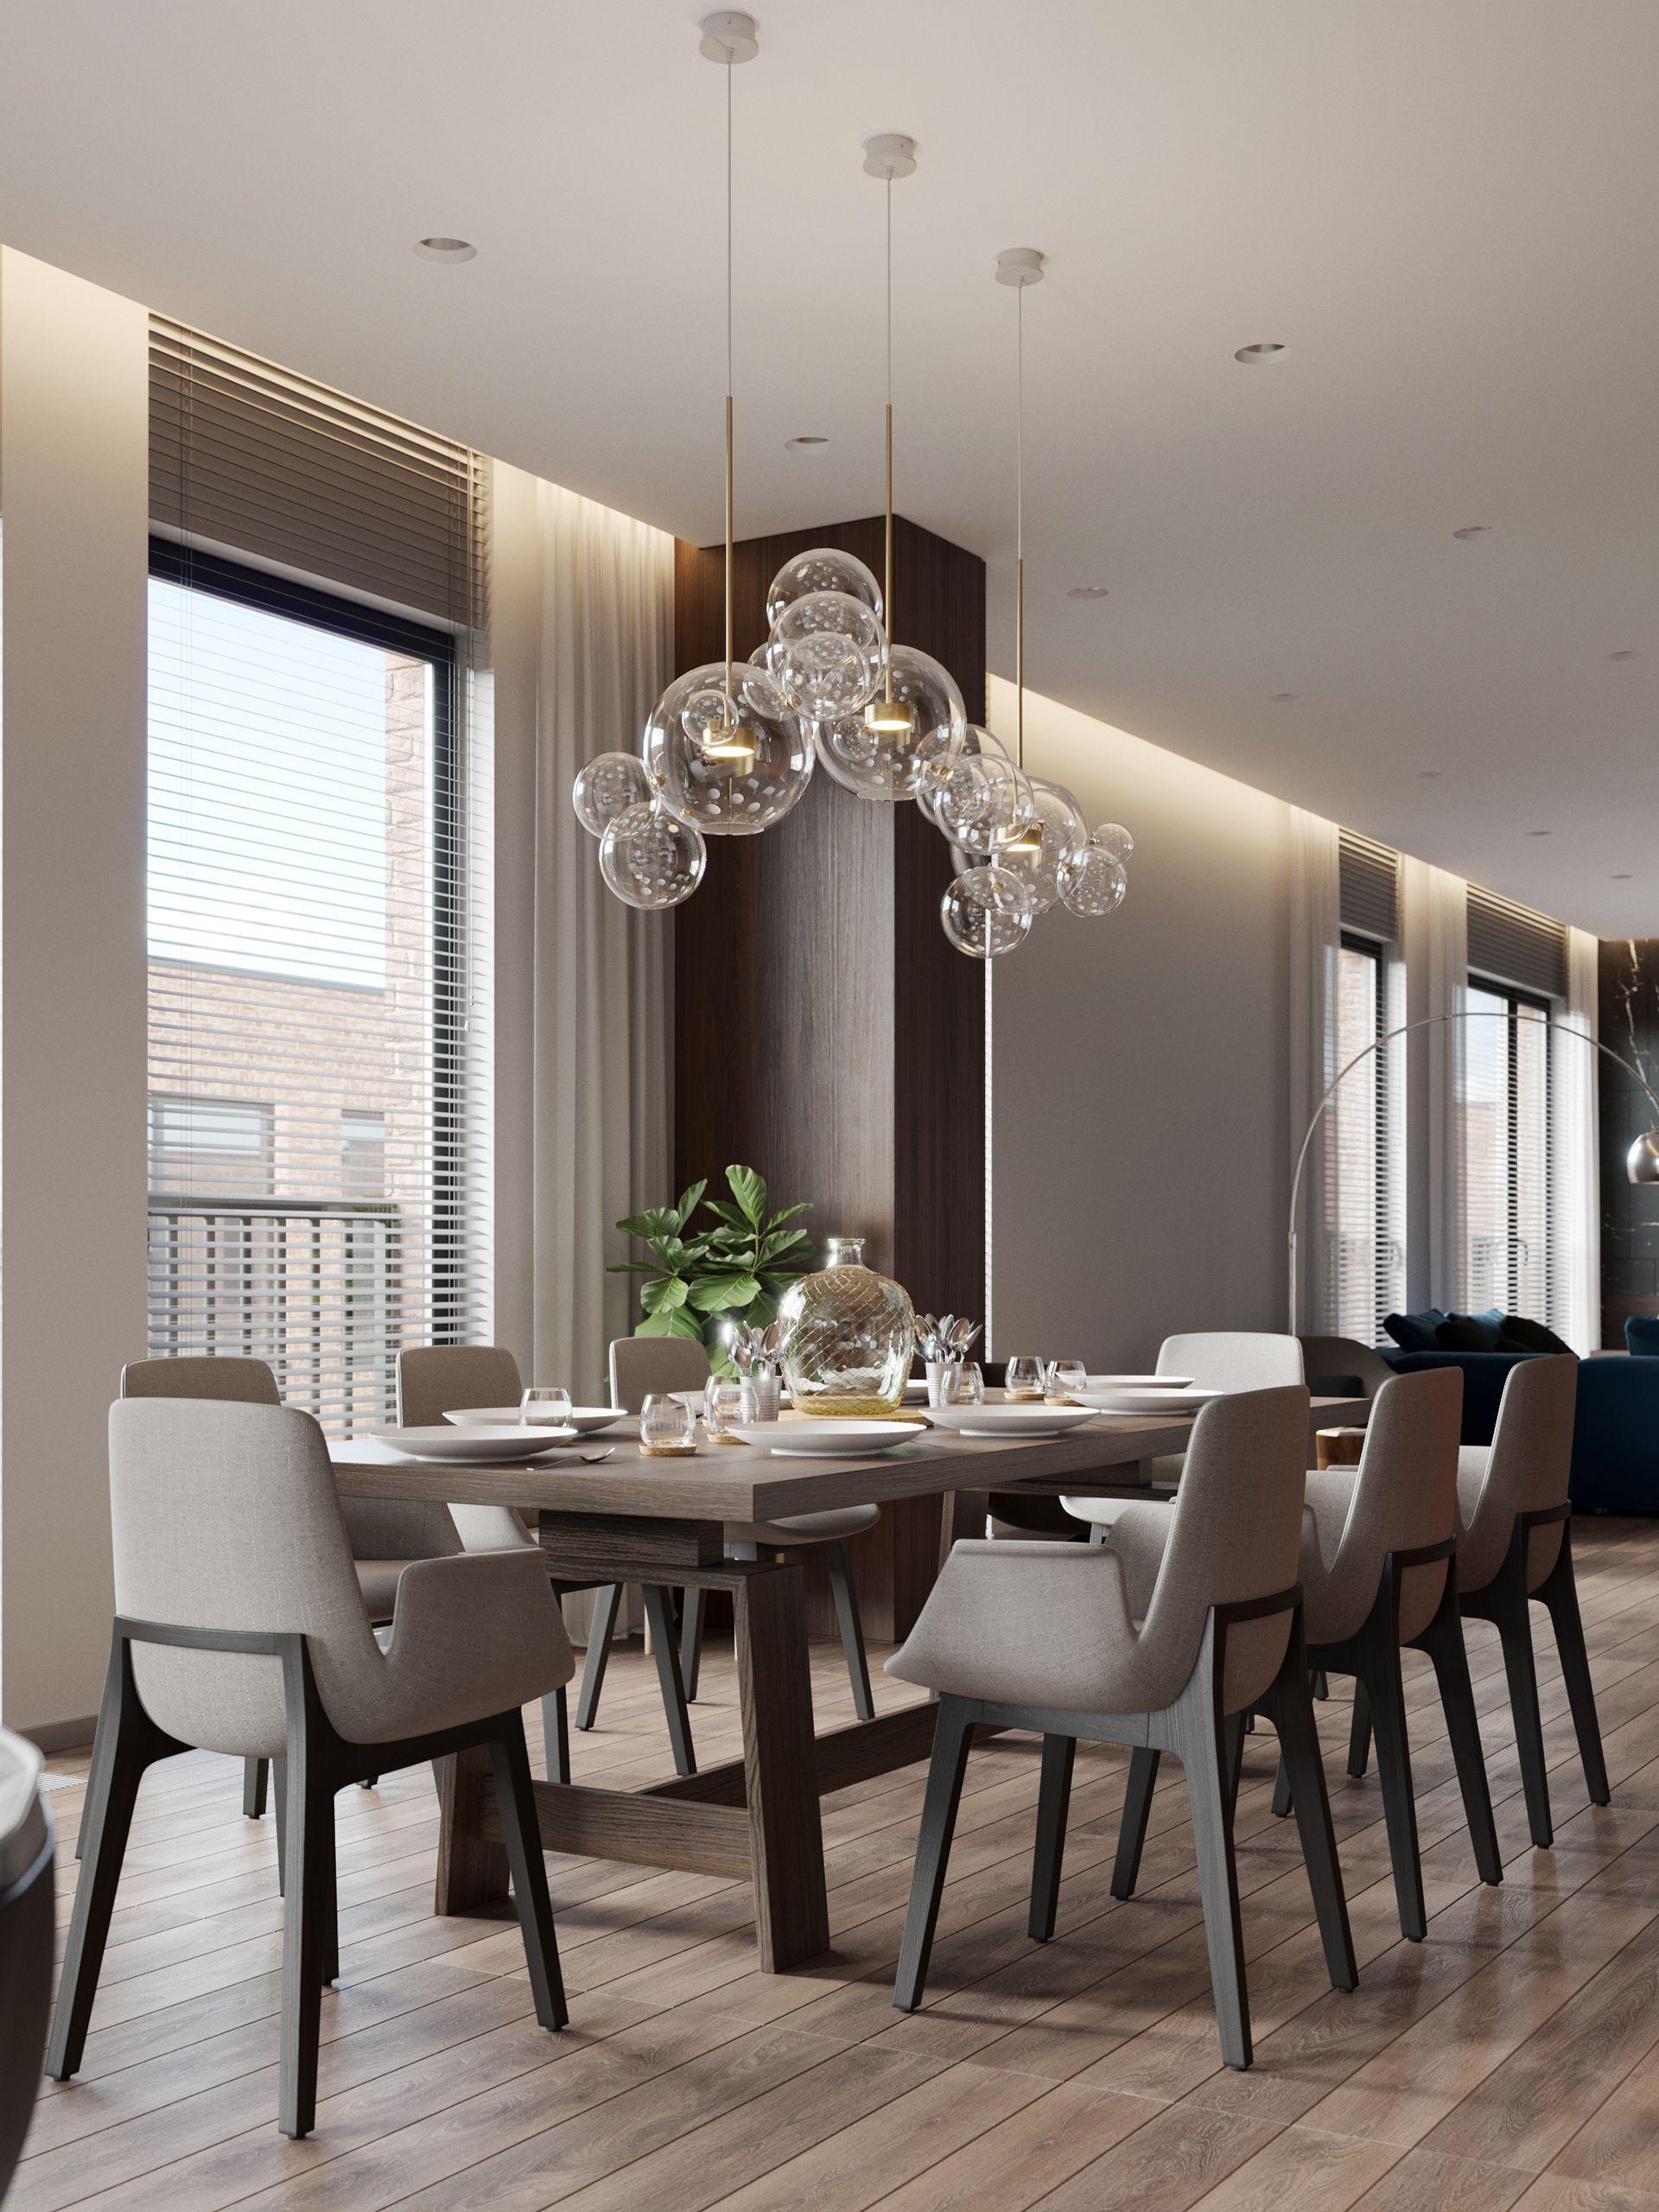 50 Best Modern Dining Room Design Ideas Farmtable Dining Room Dining Room Design Ideas Design Dining Room D Dizajn Stolovoj Sovremennyj Dizajn Doma Interer